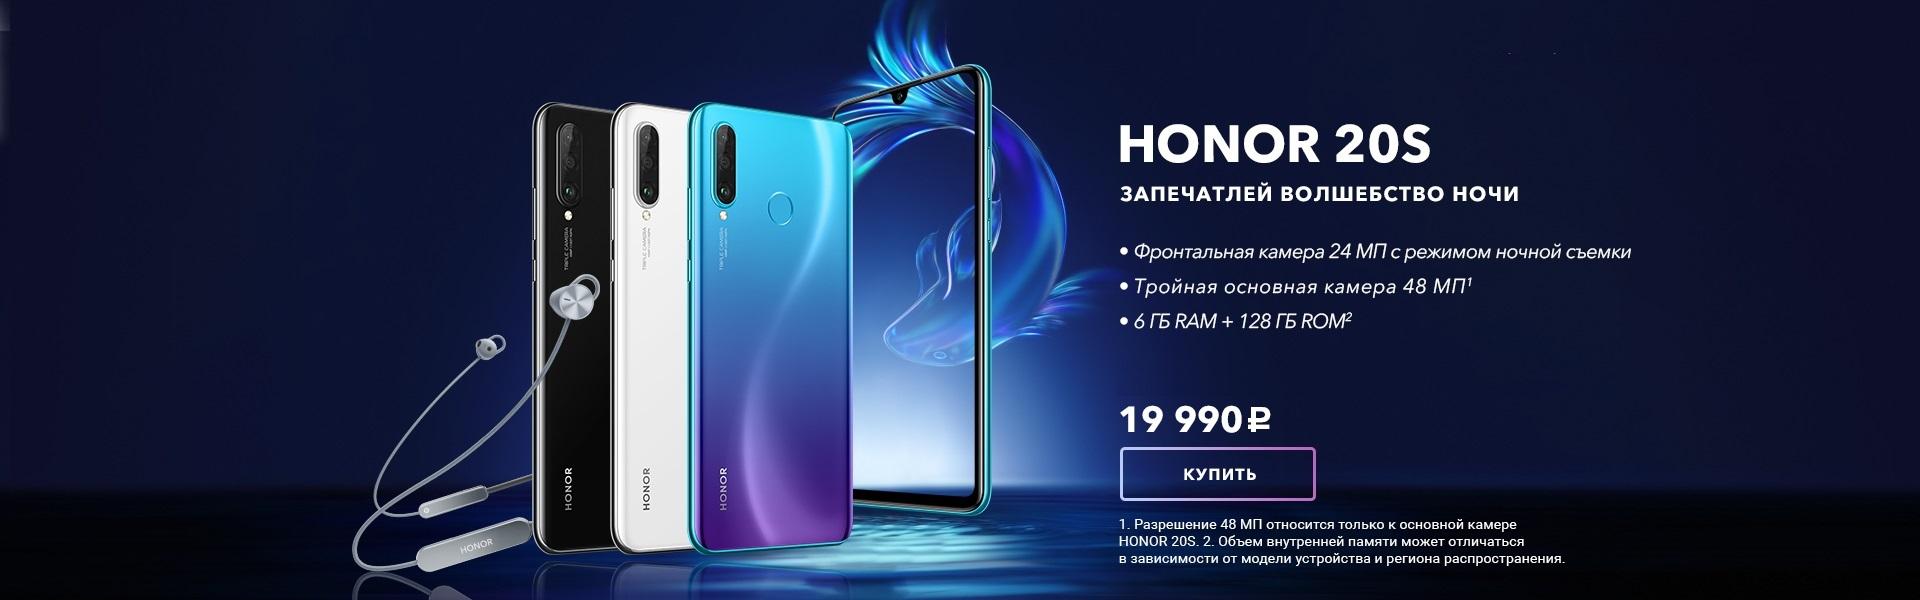 honor huawei официальный сайт россия